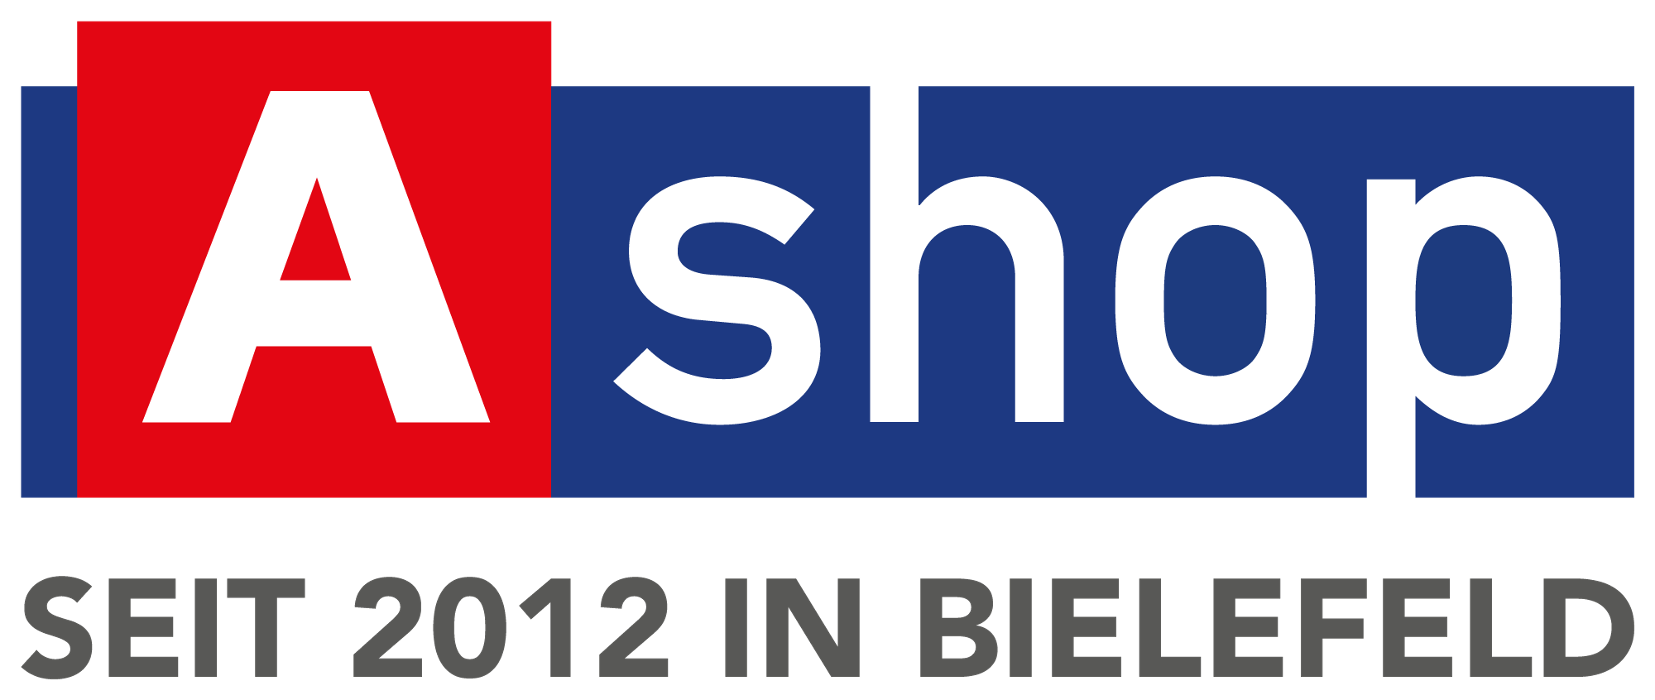 Ashop Bielefeld in Bielefeld